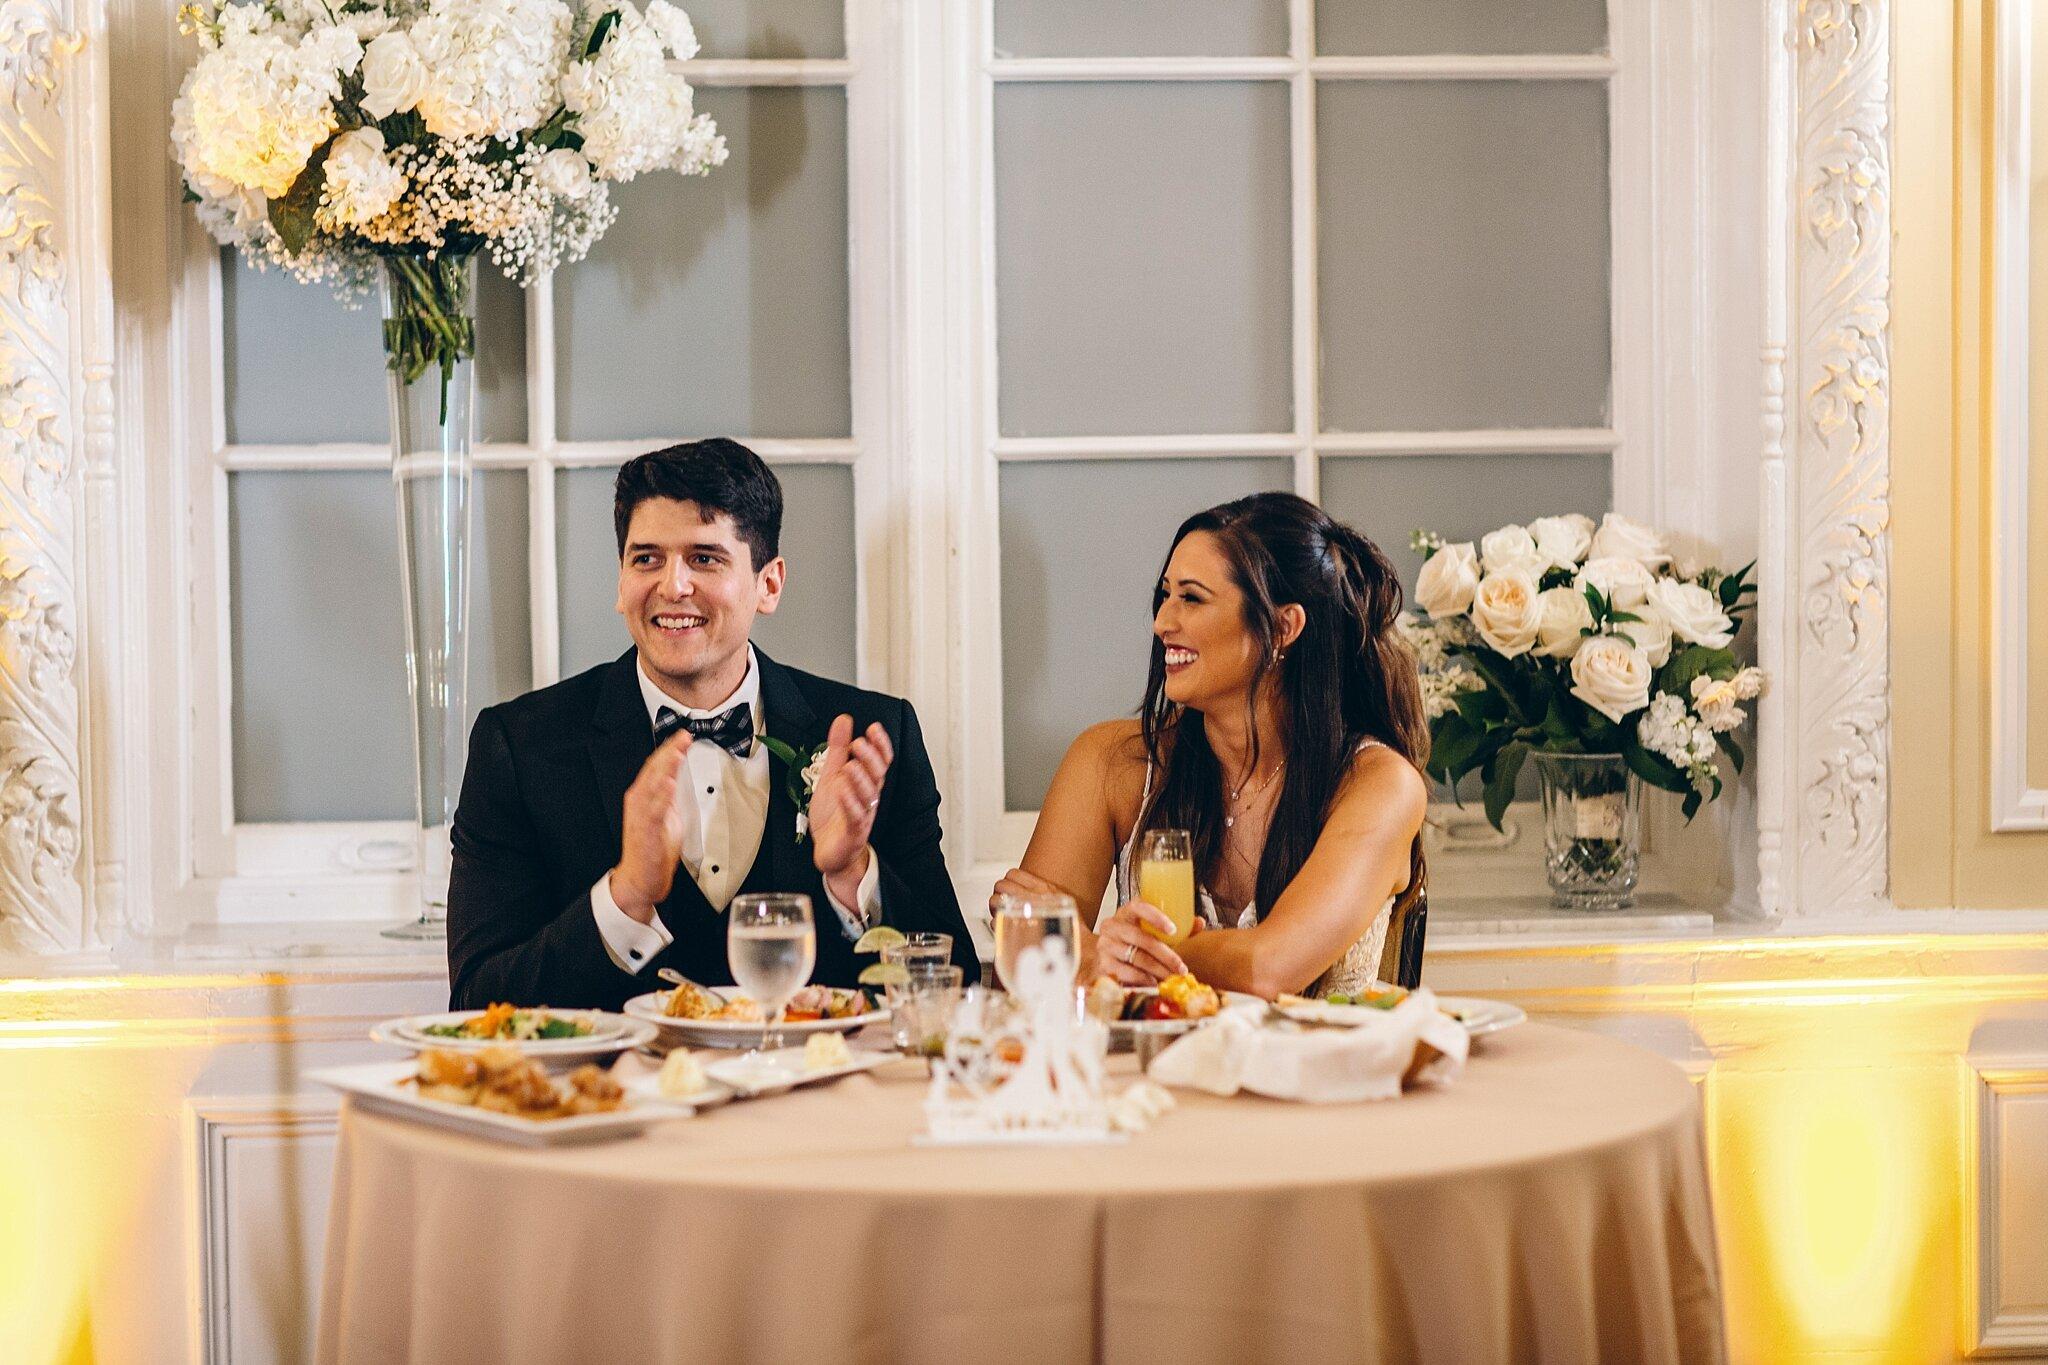 patrick-henry-ballroom-wedding-roanoke_0533.jpg